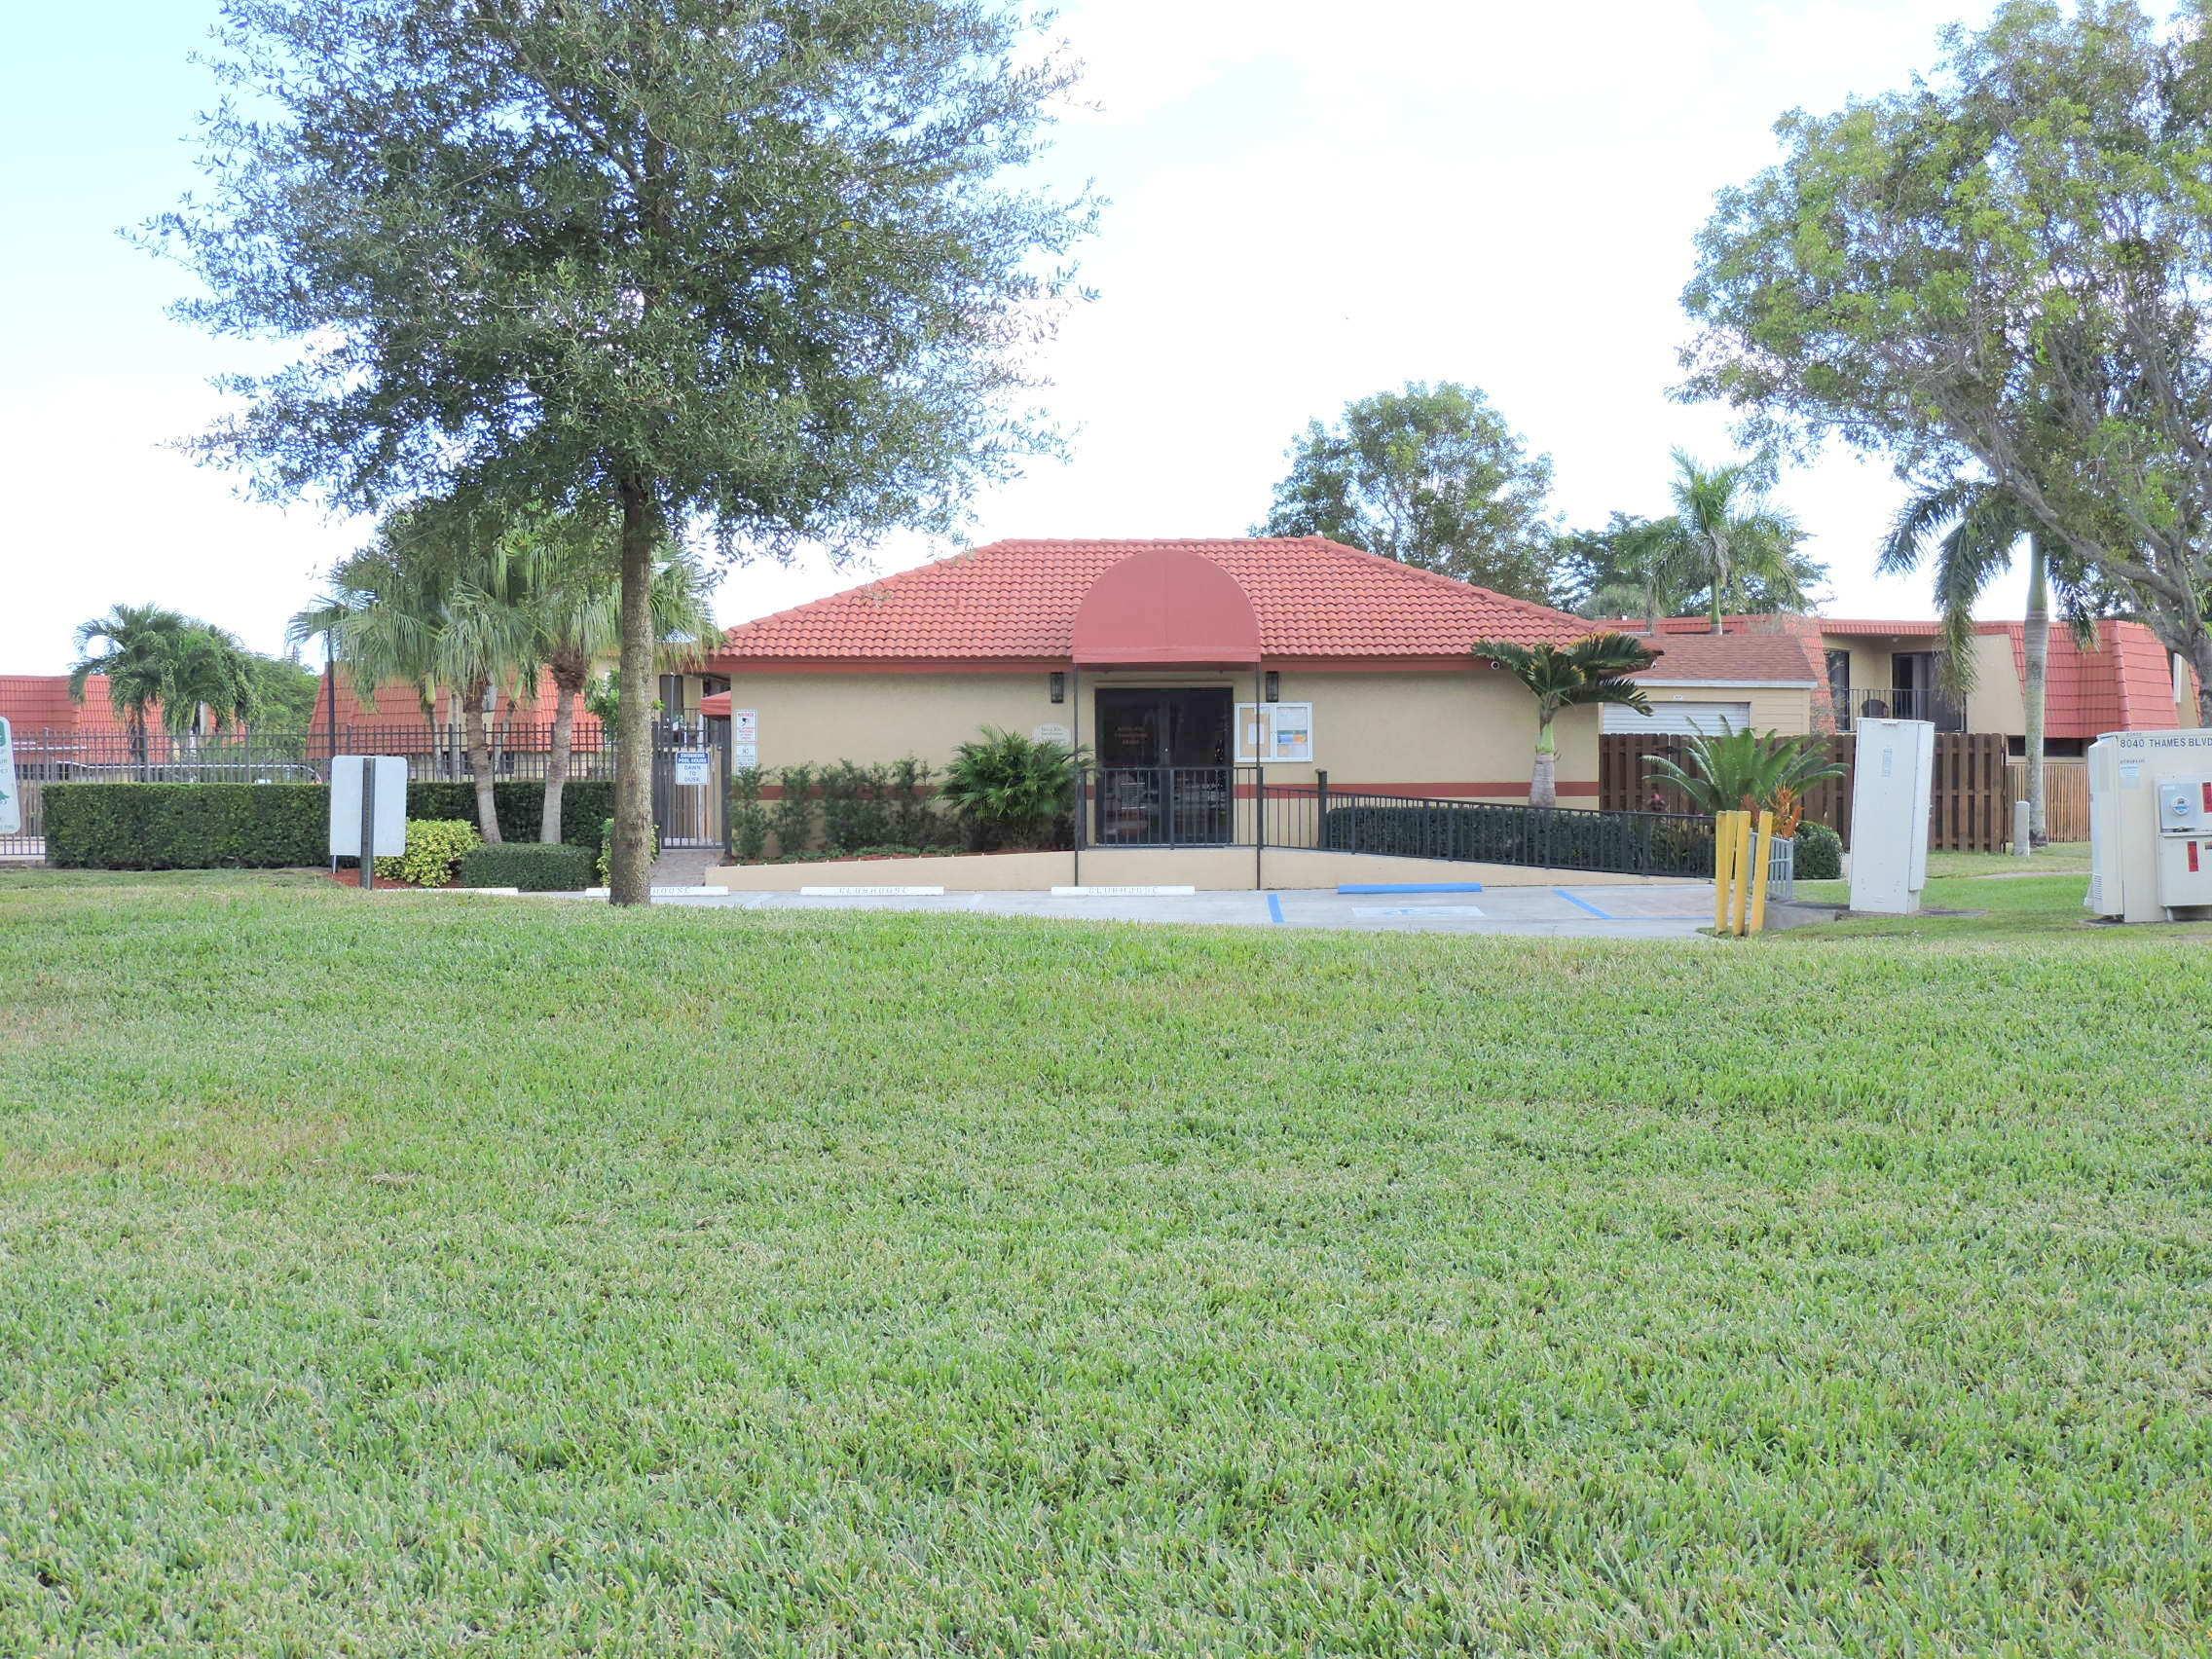 8400 Trent Court Boca Raton, FL 33433